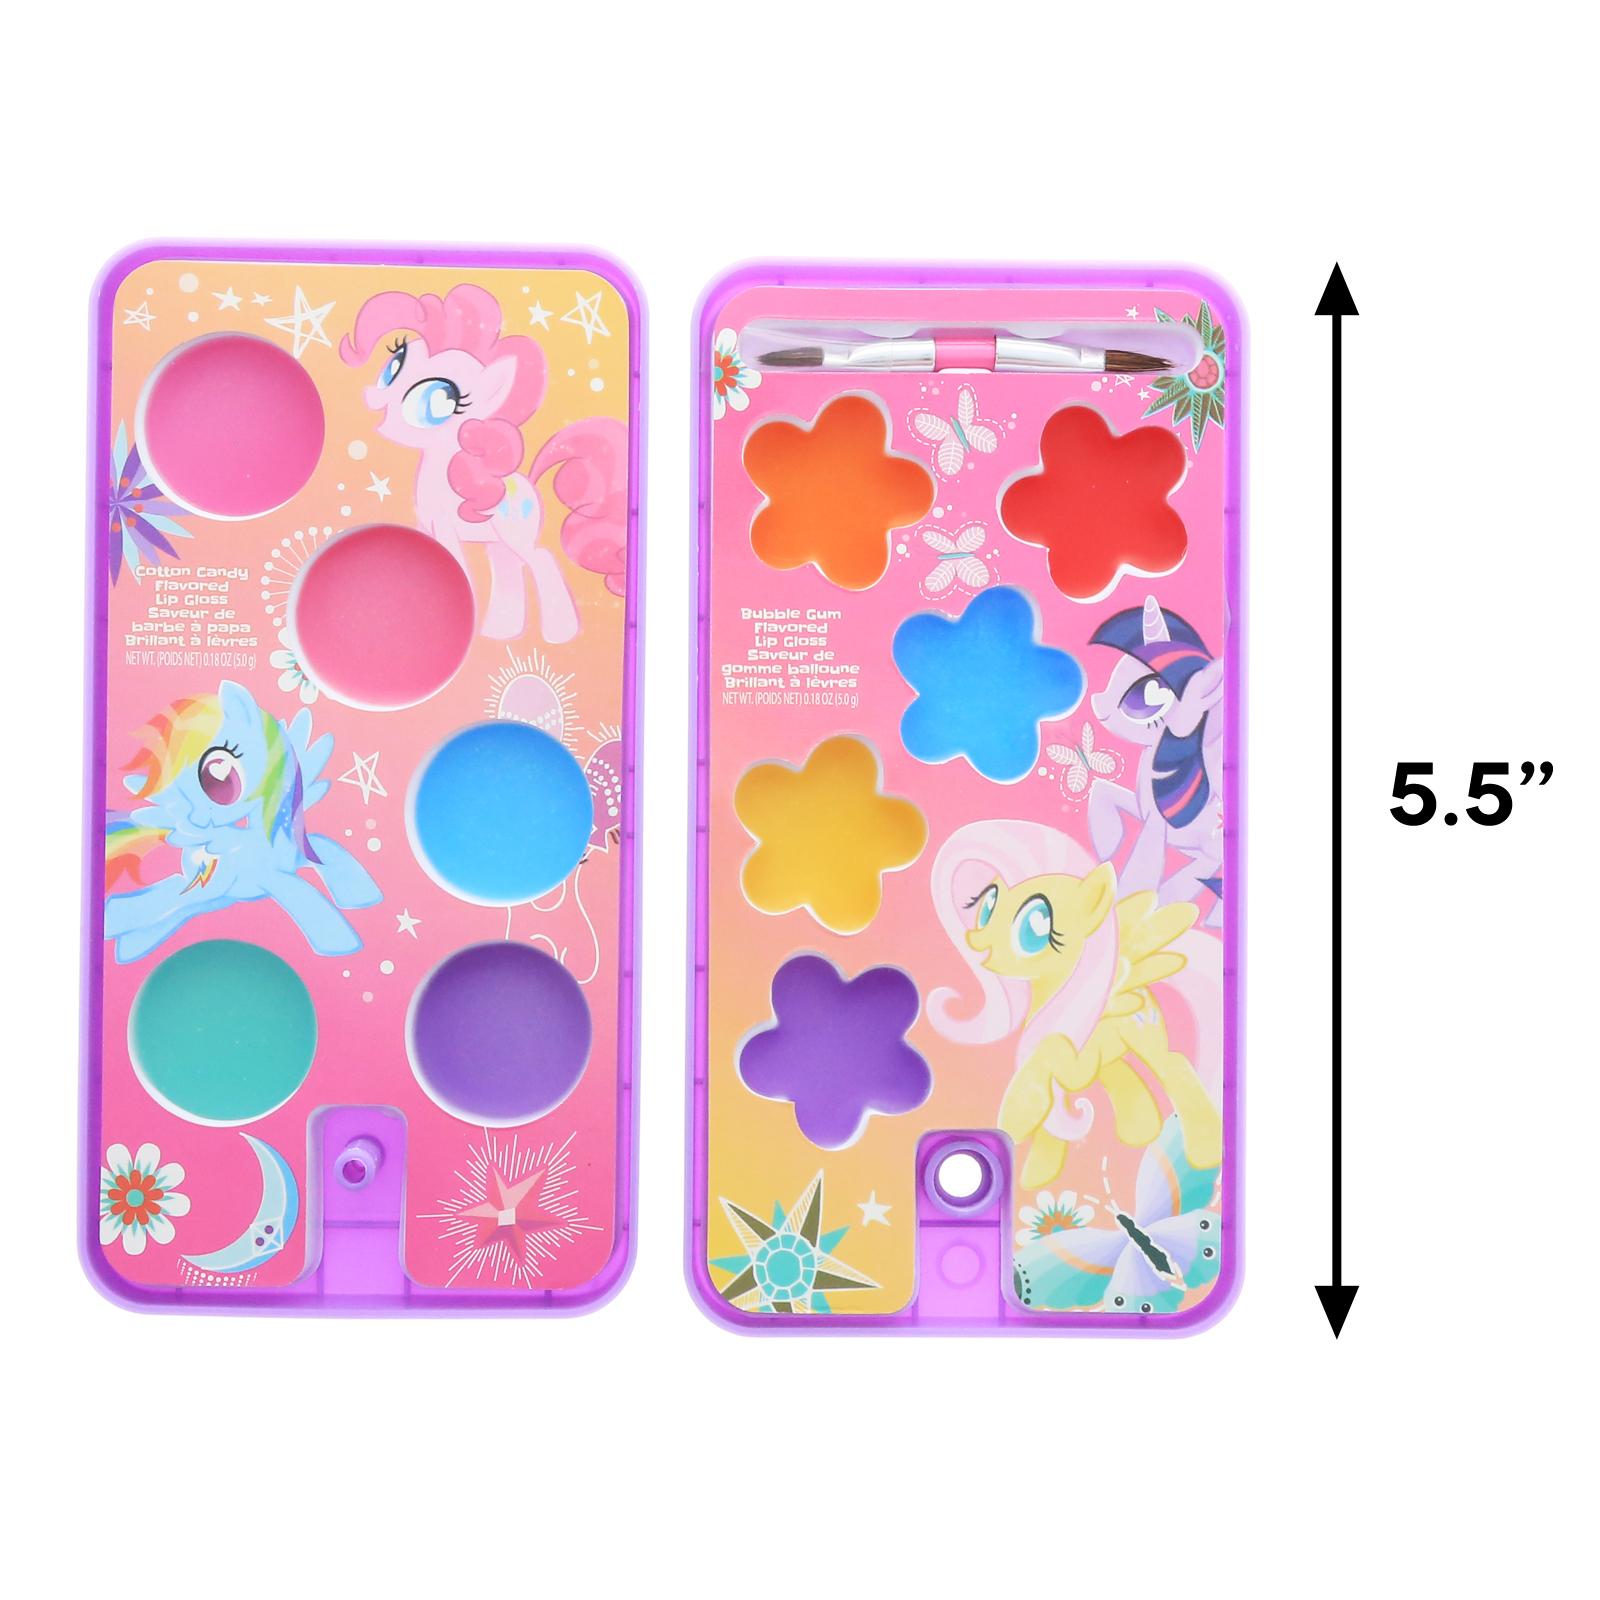 My Little Pony Girls Make Up Cosmetic Set Lip Gloss Smart Phone Style Case